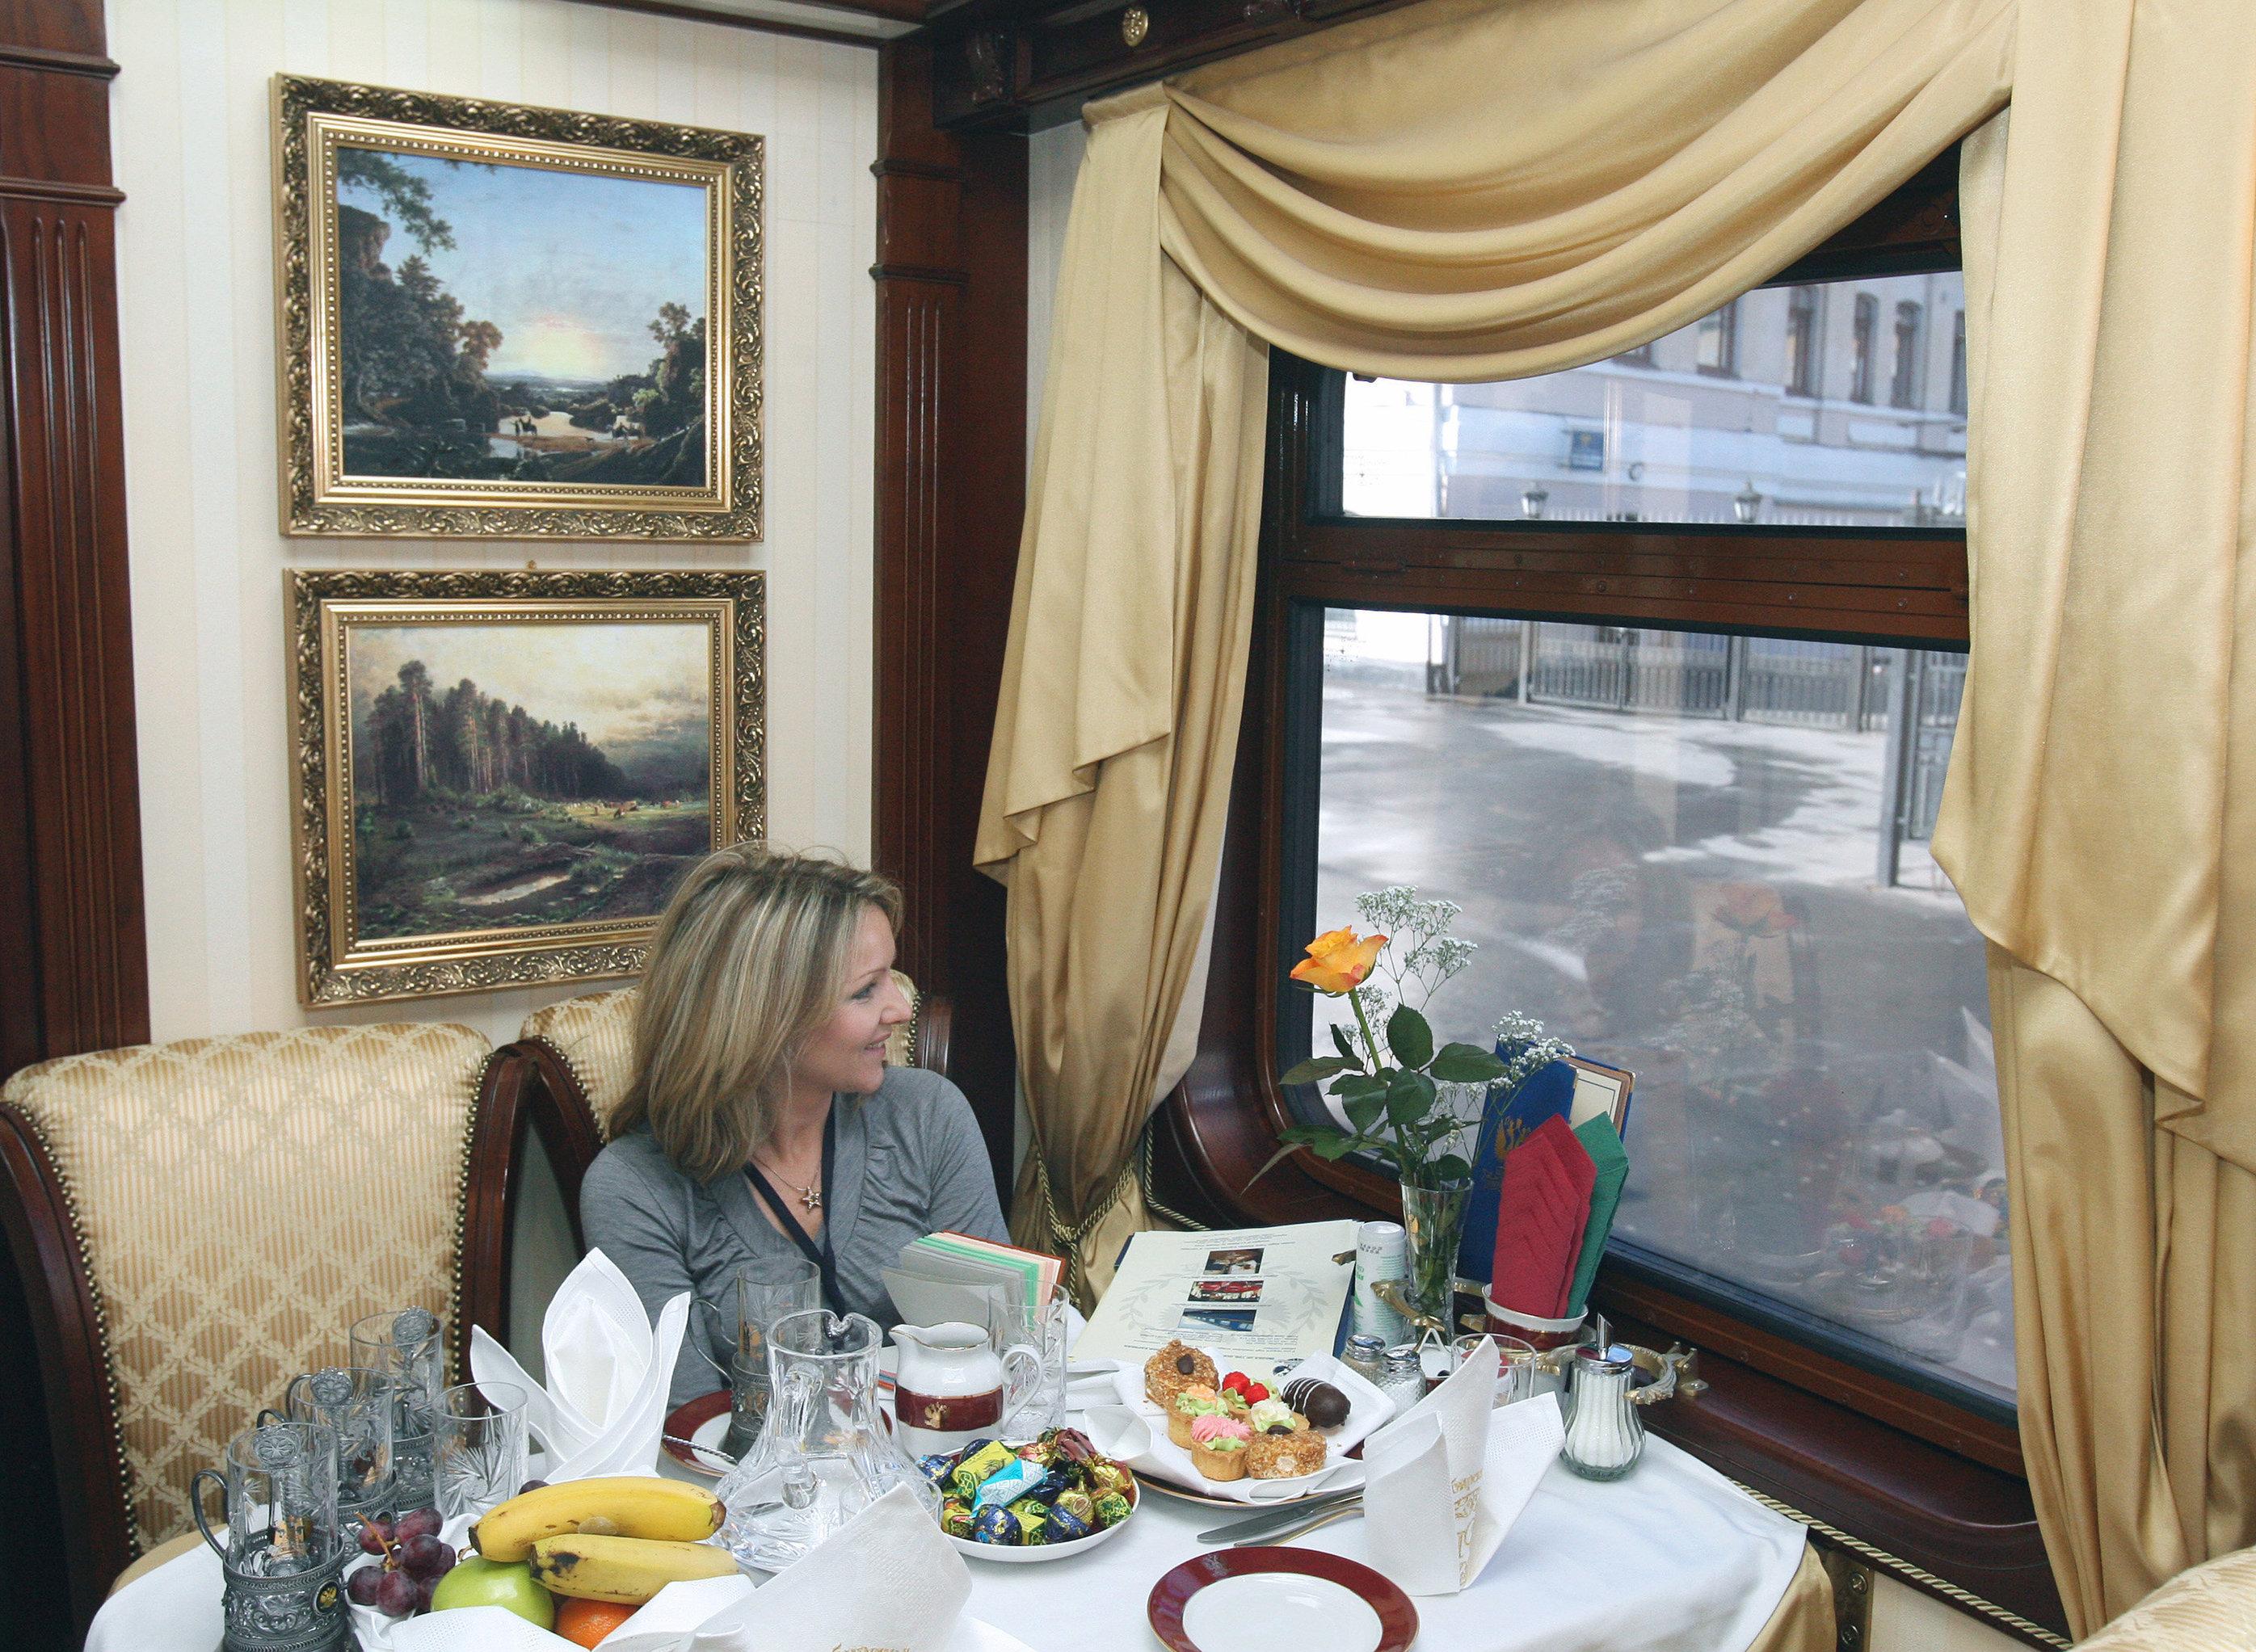 A Golden Eagle Luxury train's restaurant